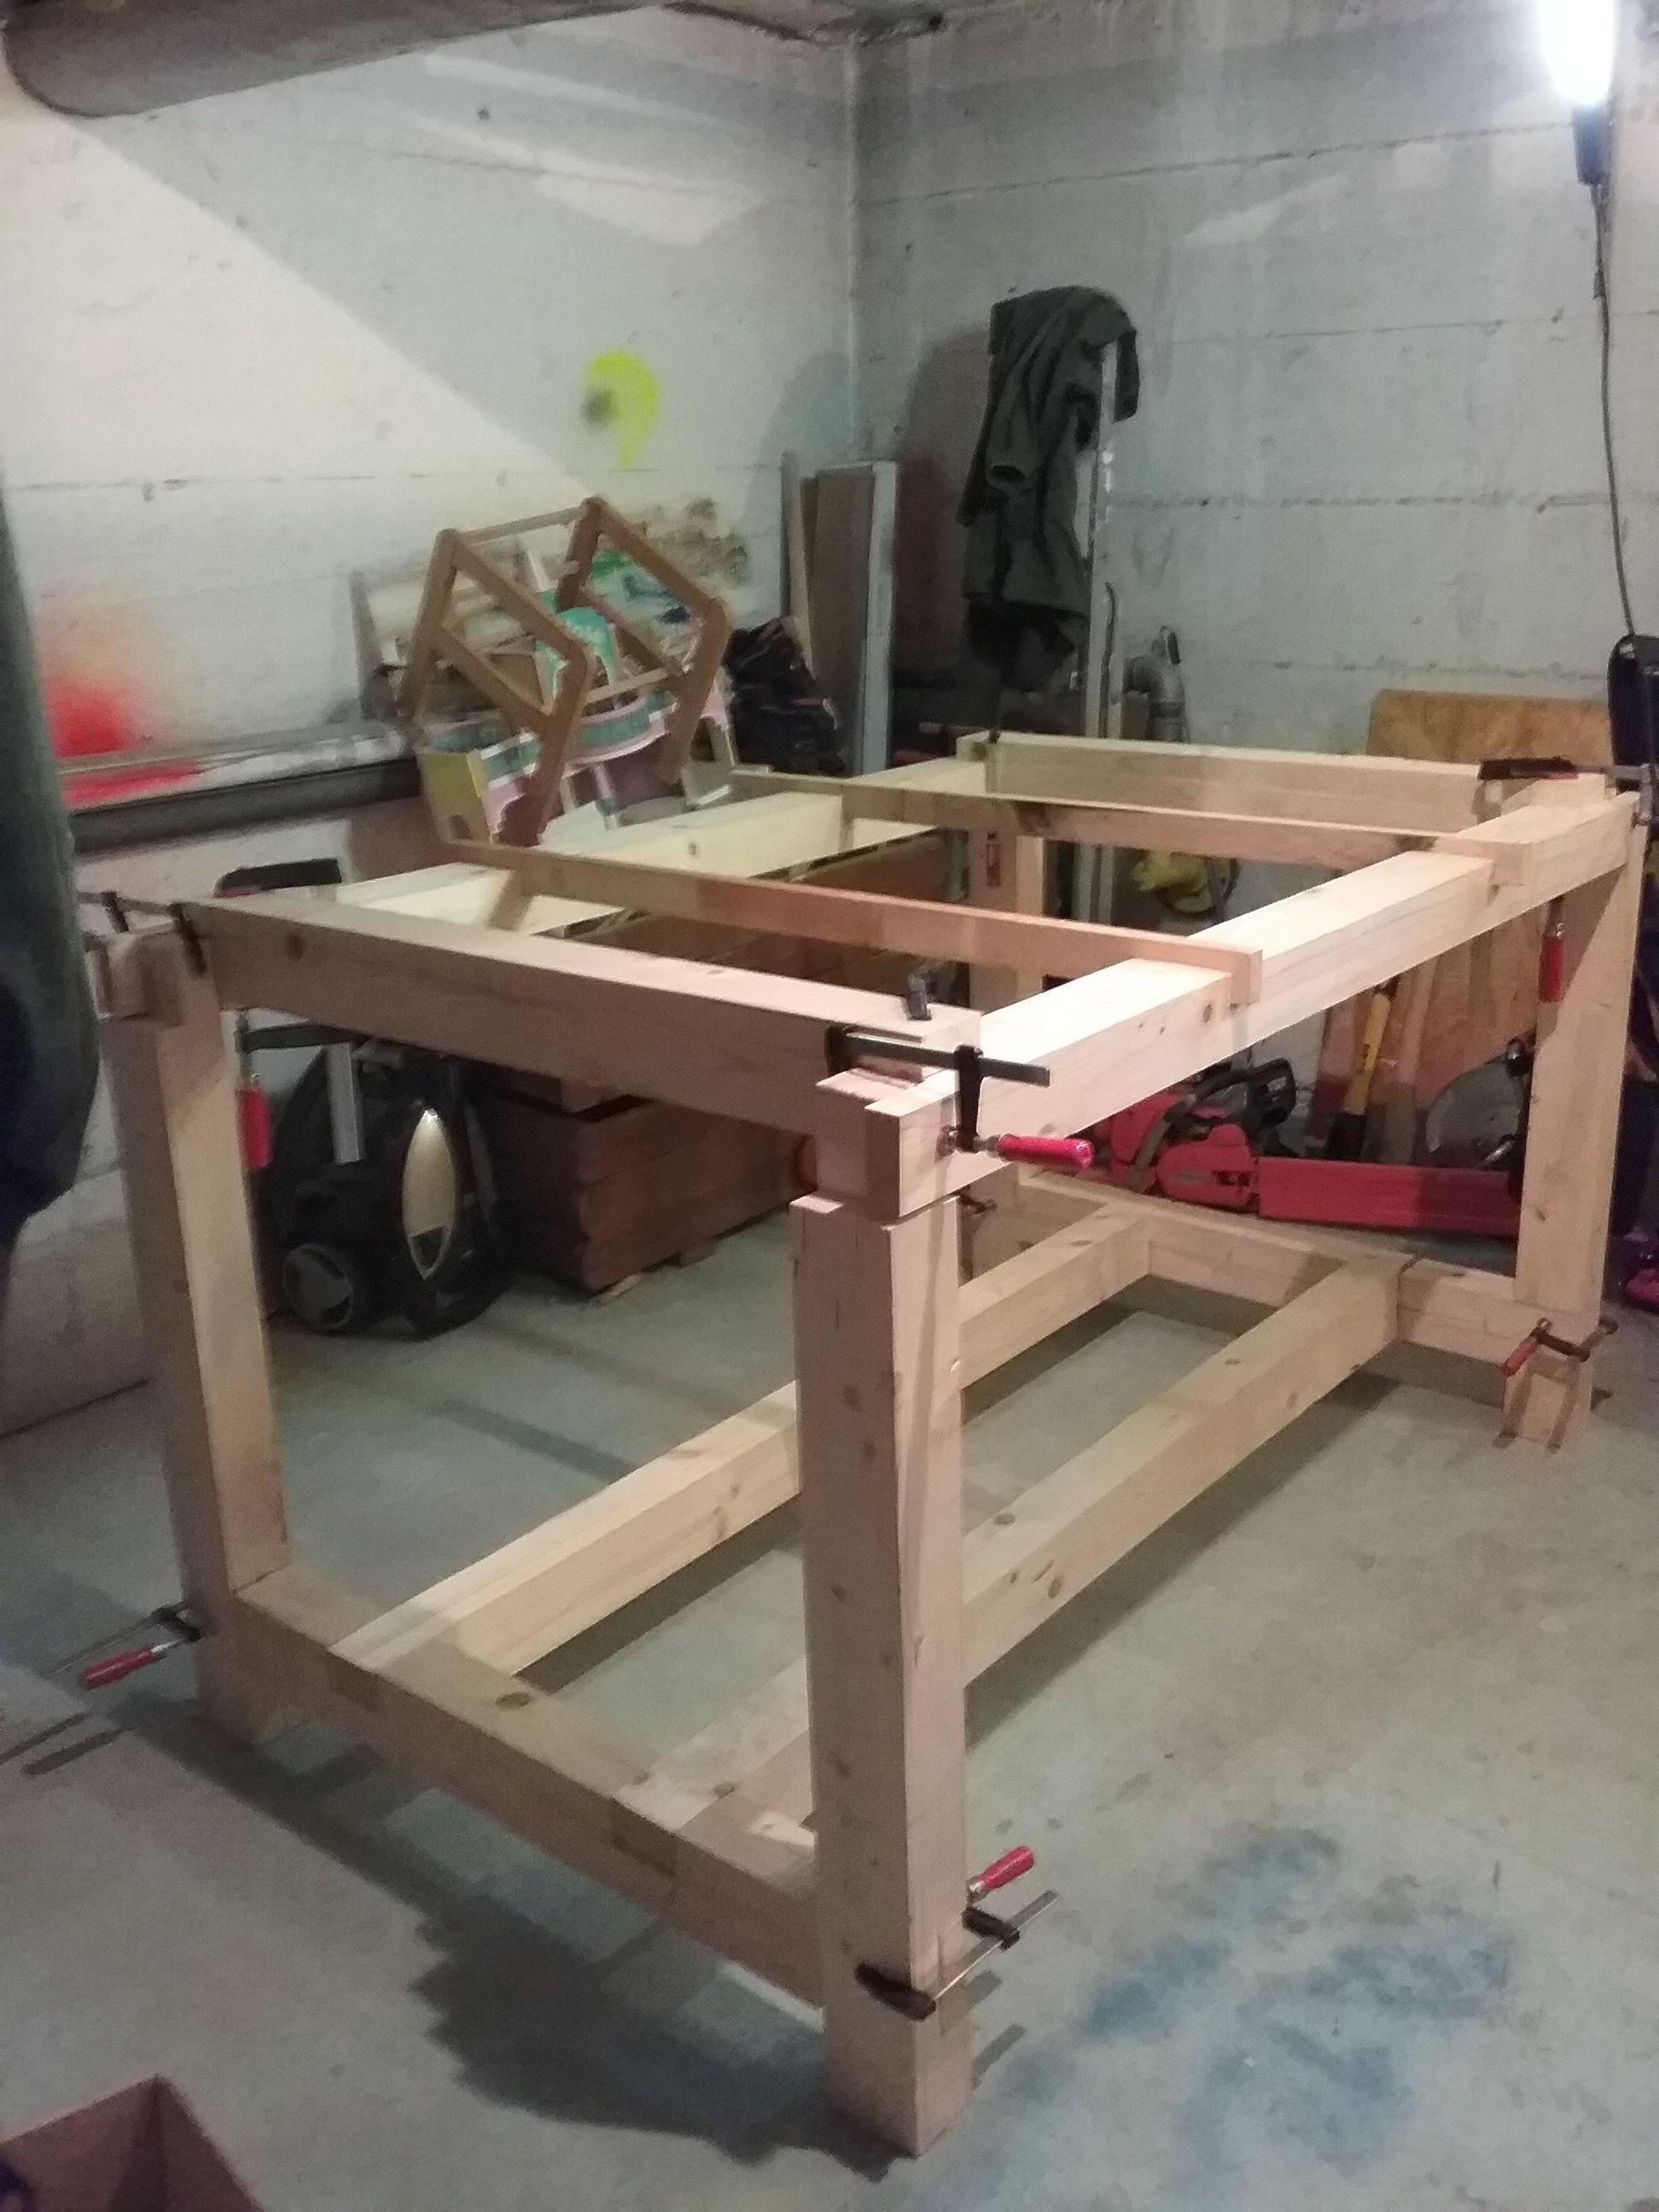 werktisch hobelbank bauanleitung zum selber bauen. Black Bedroom Furniture Sets. Home Design Ideas